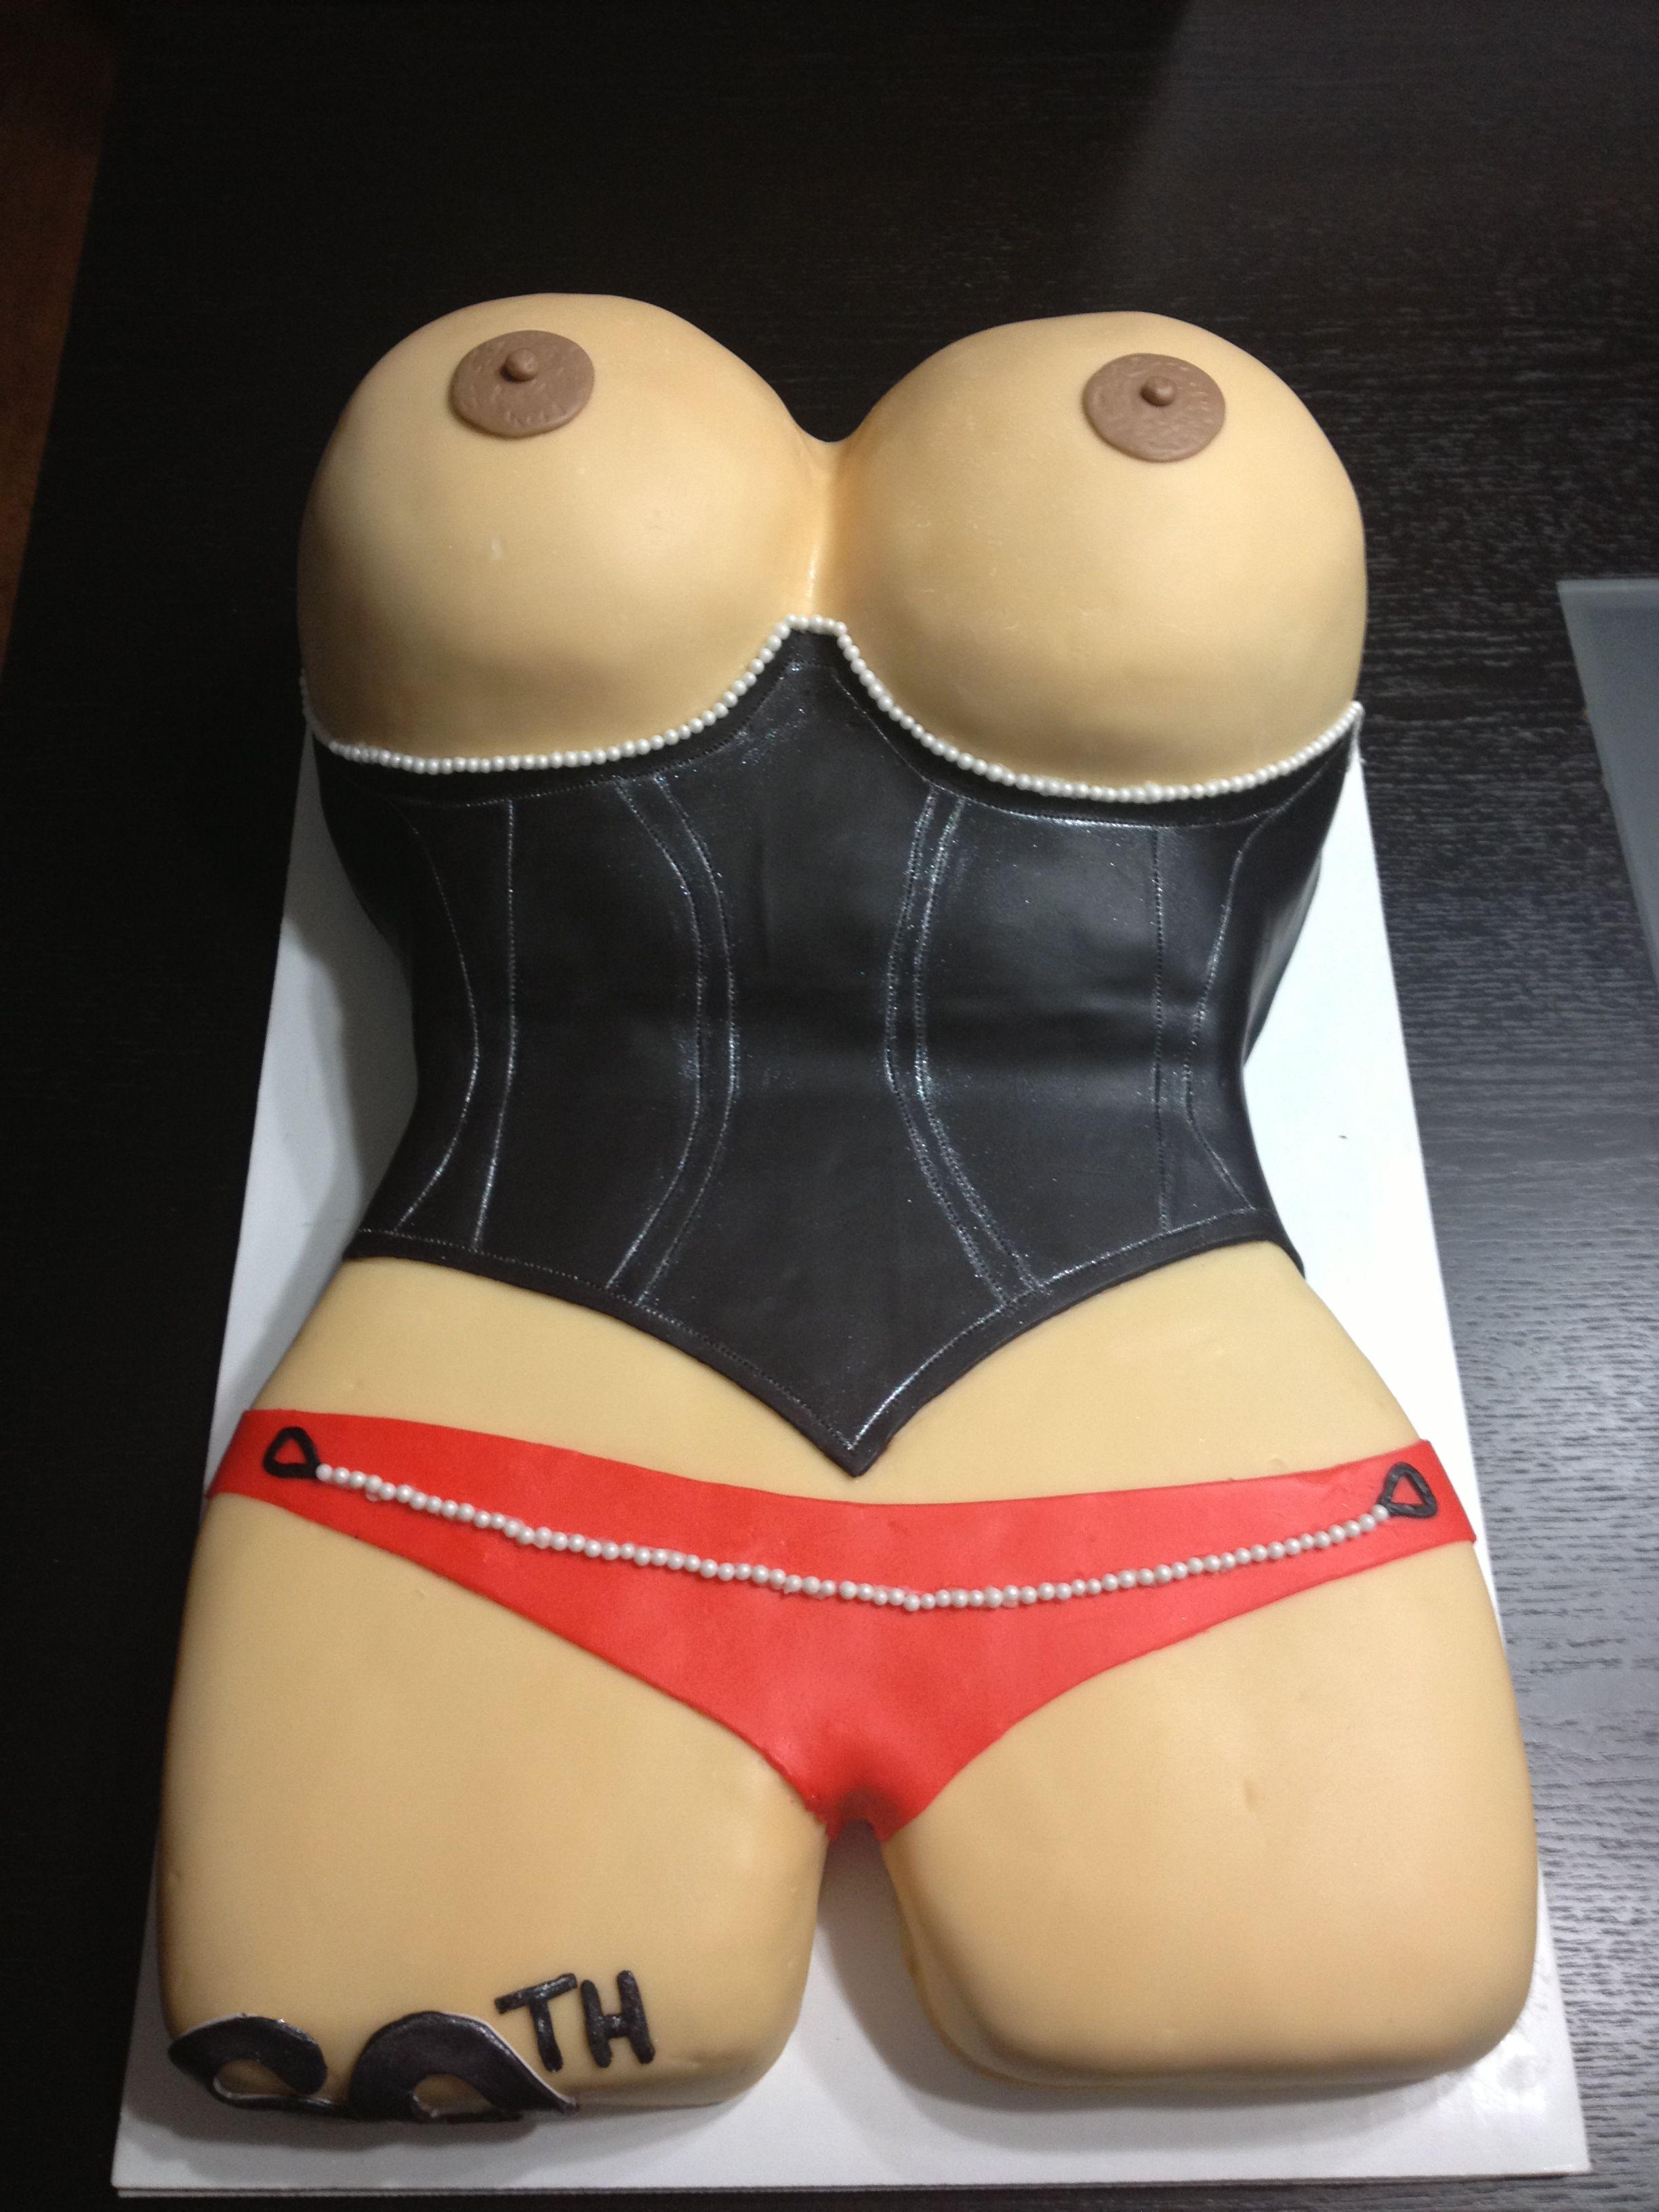 Ideas for boob cakes